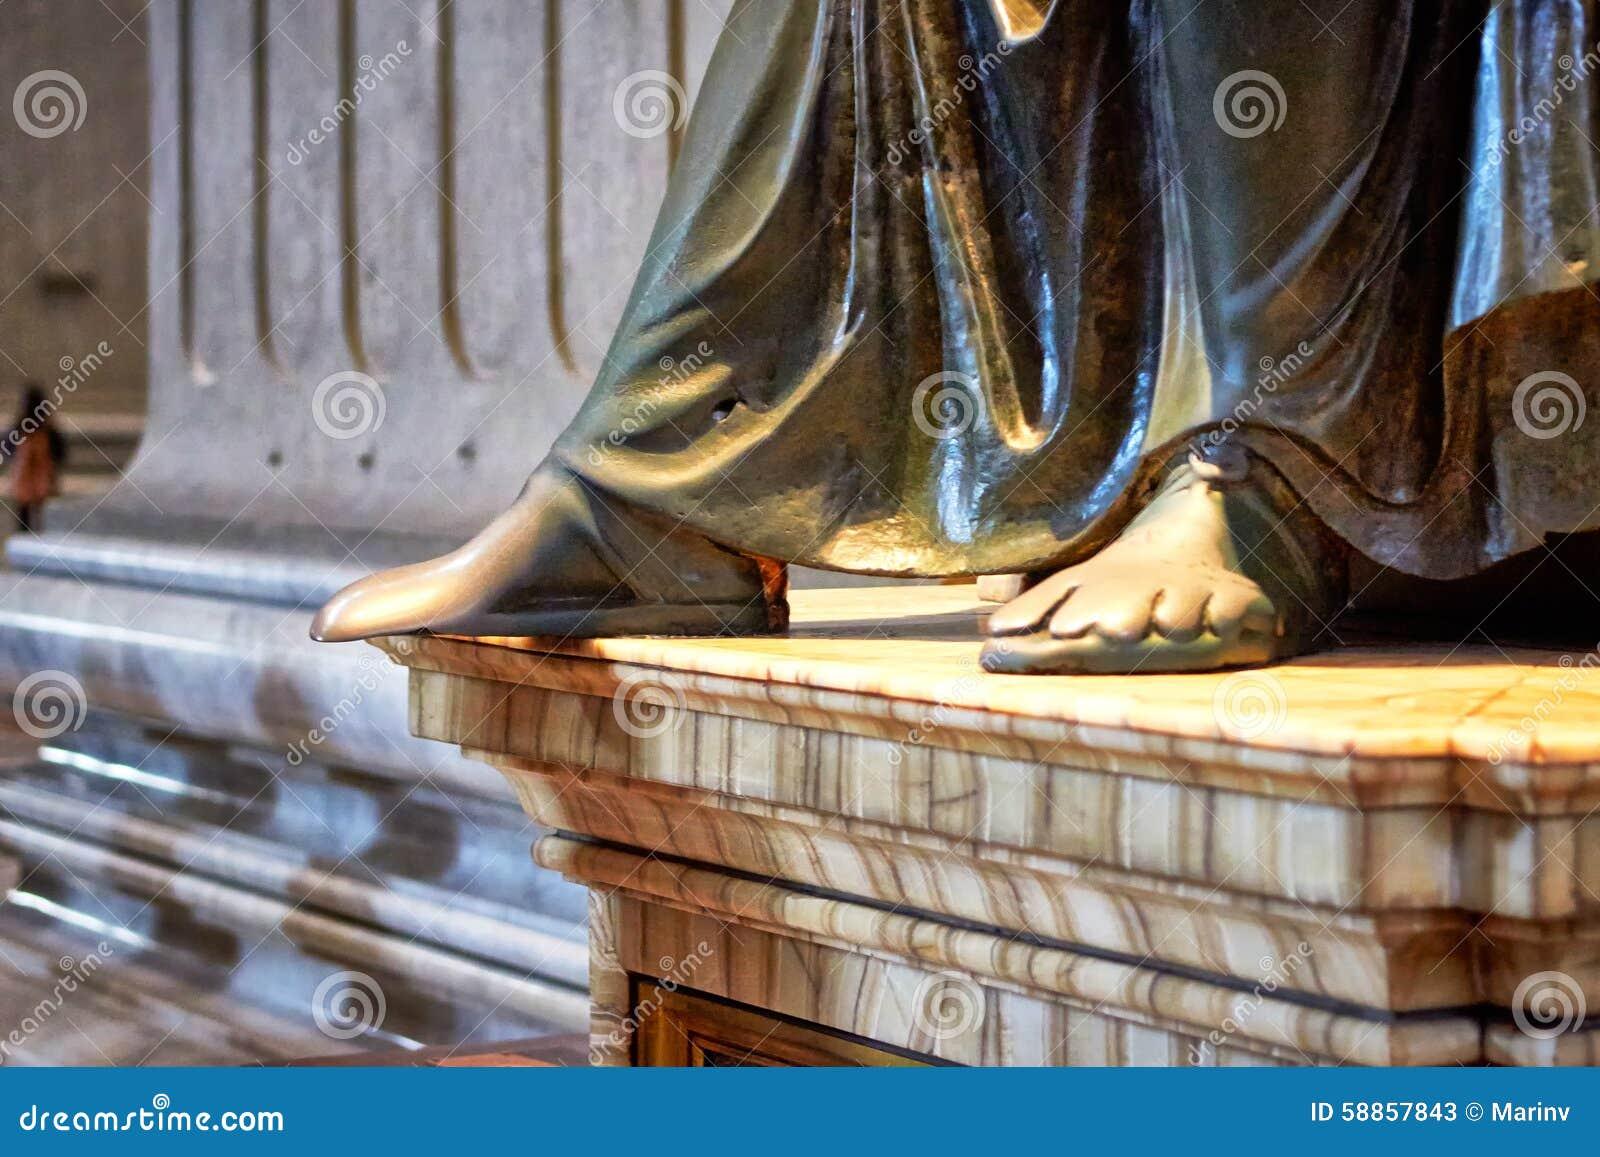 Lane feet massage